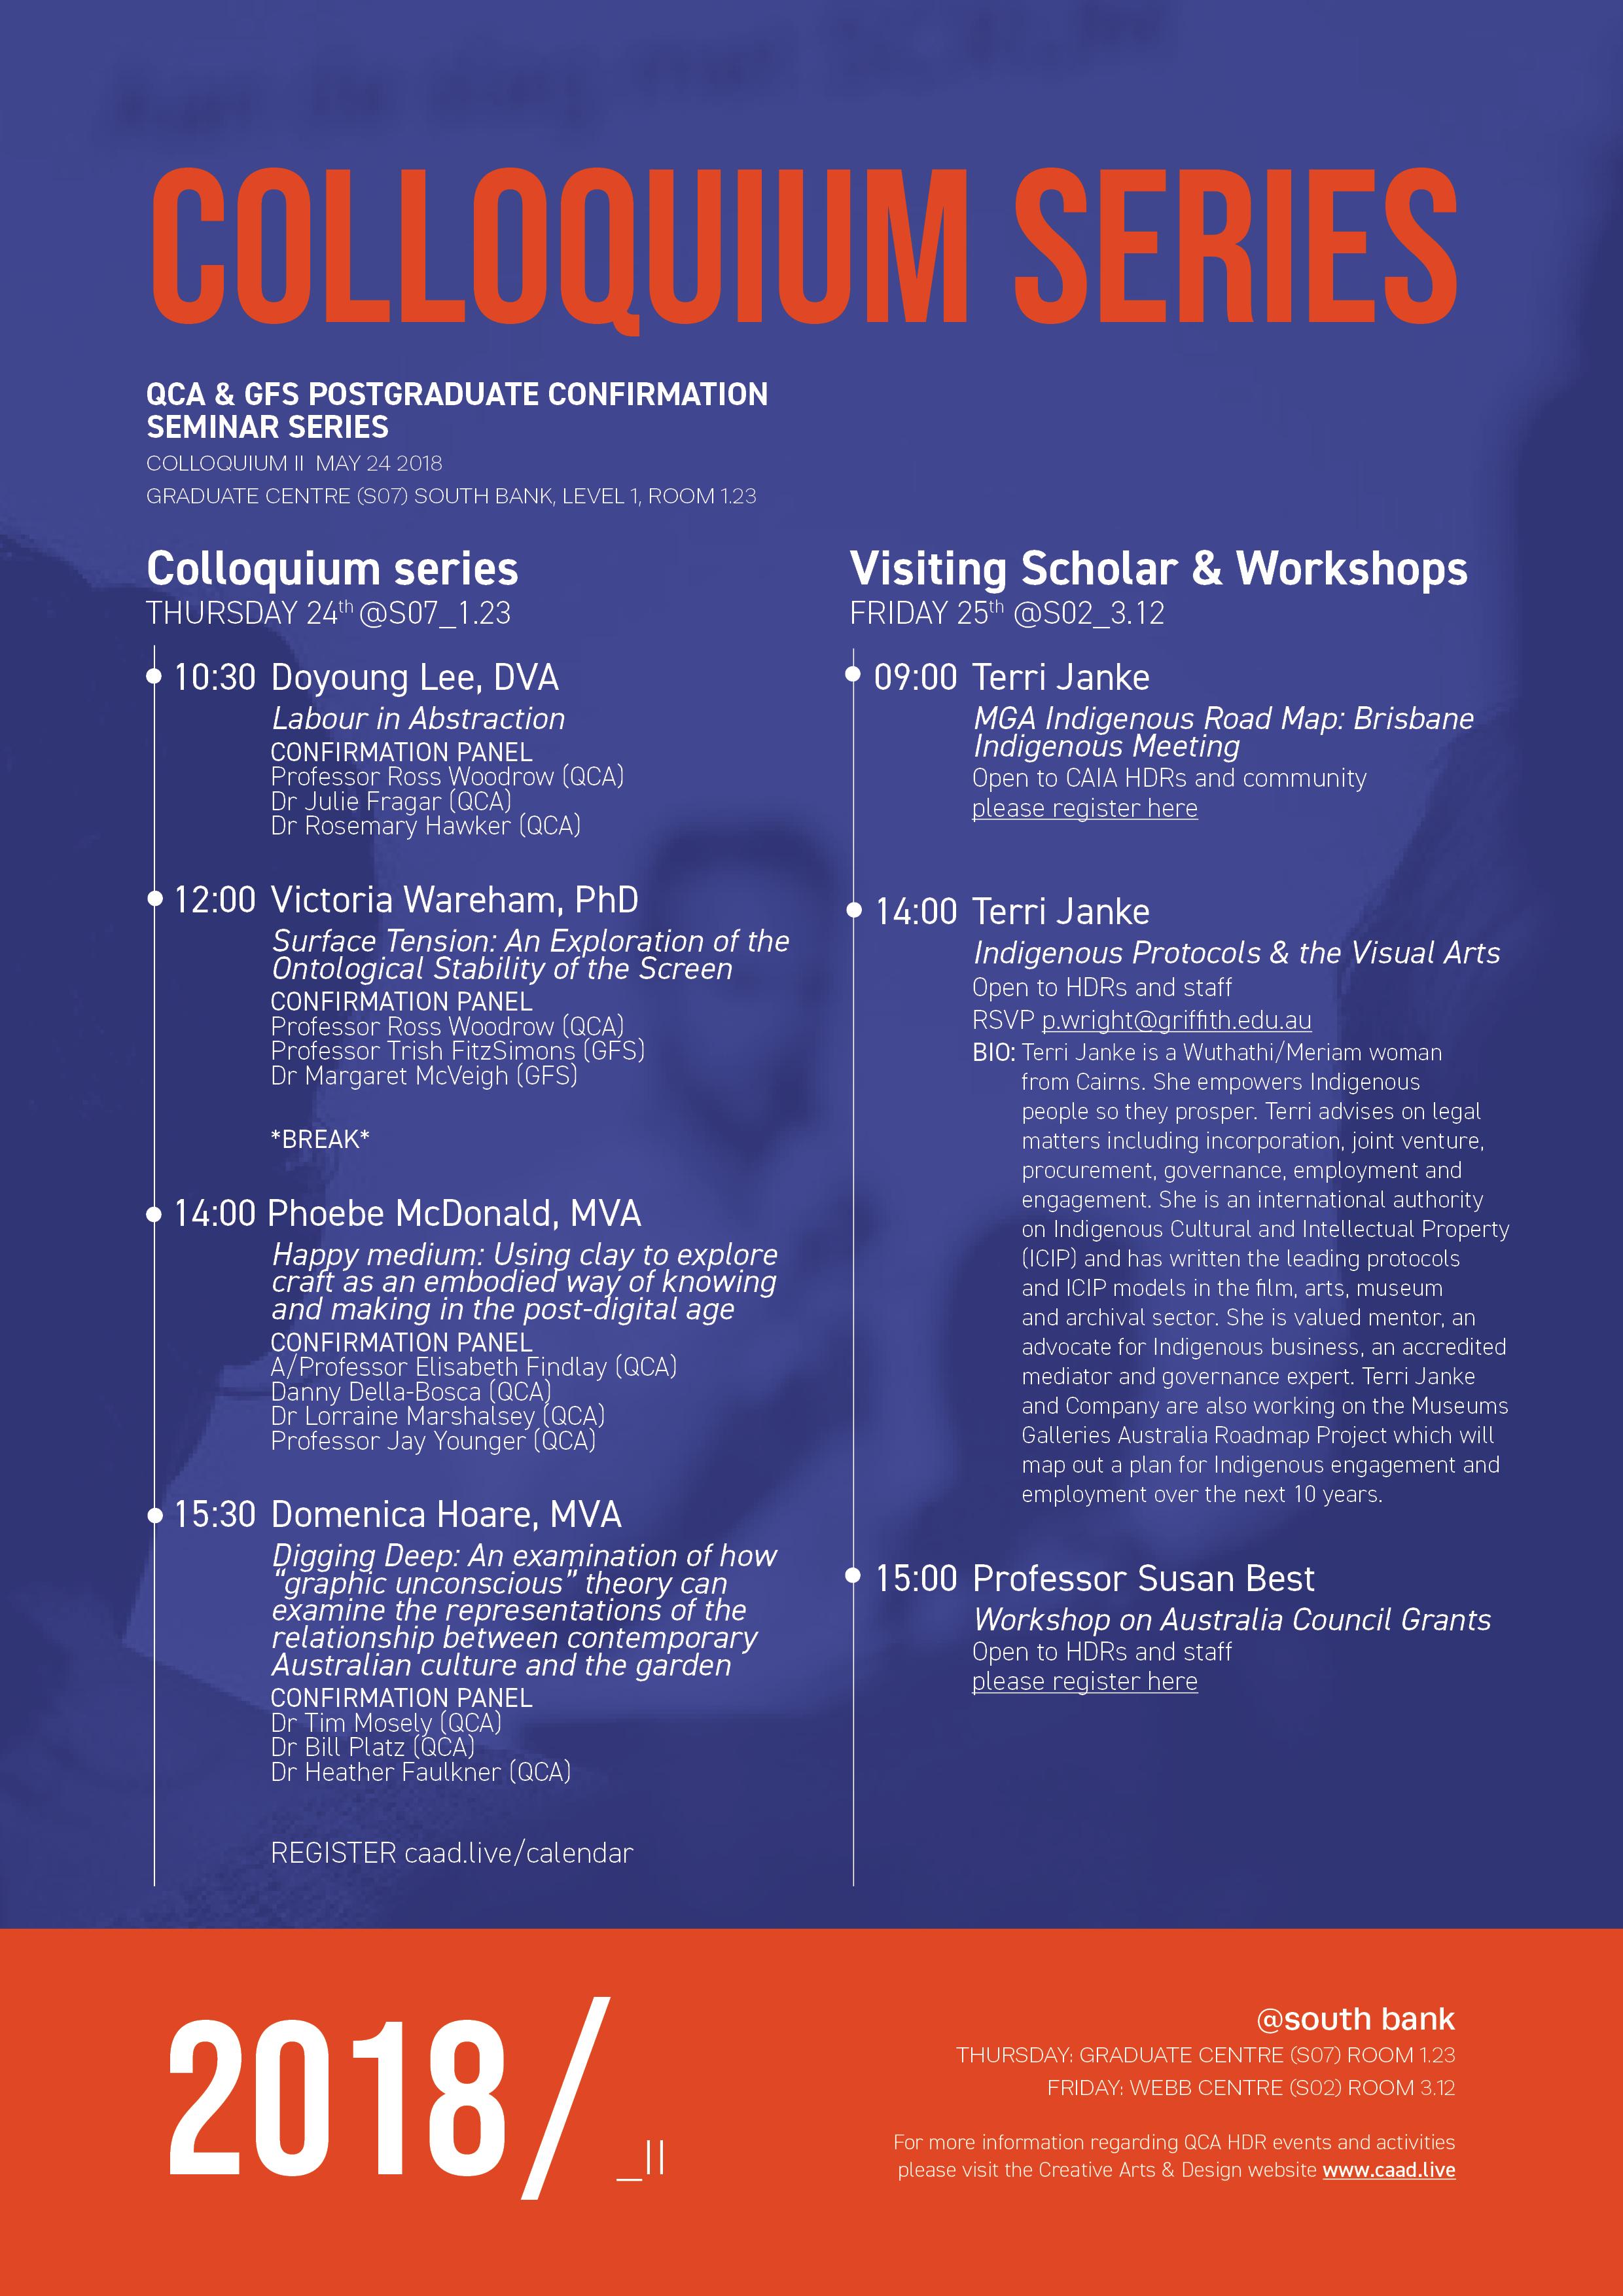 Colloquium II Schedule.jpg